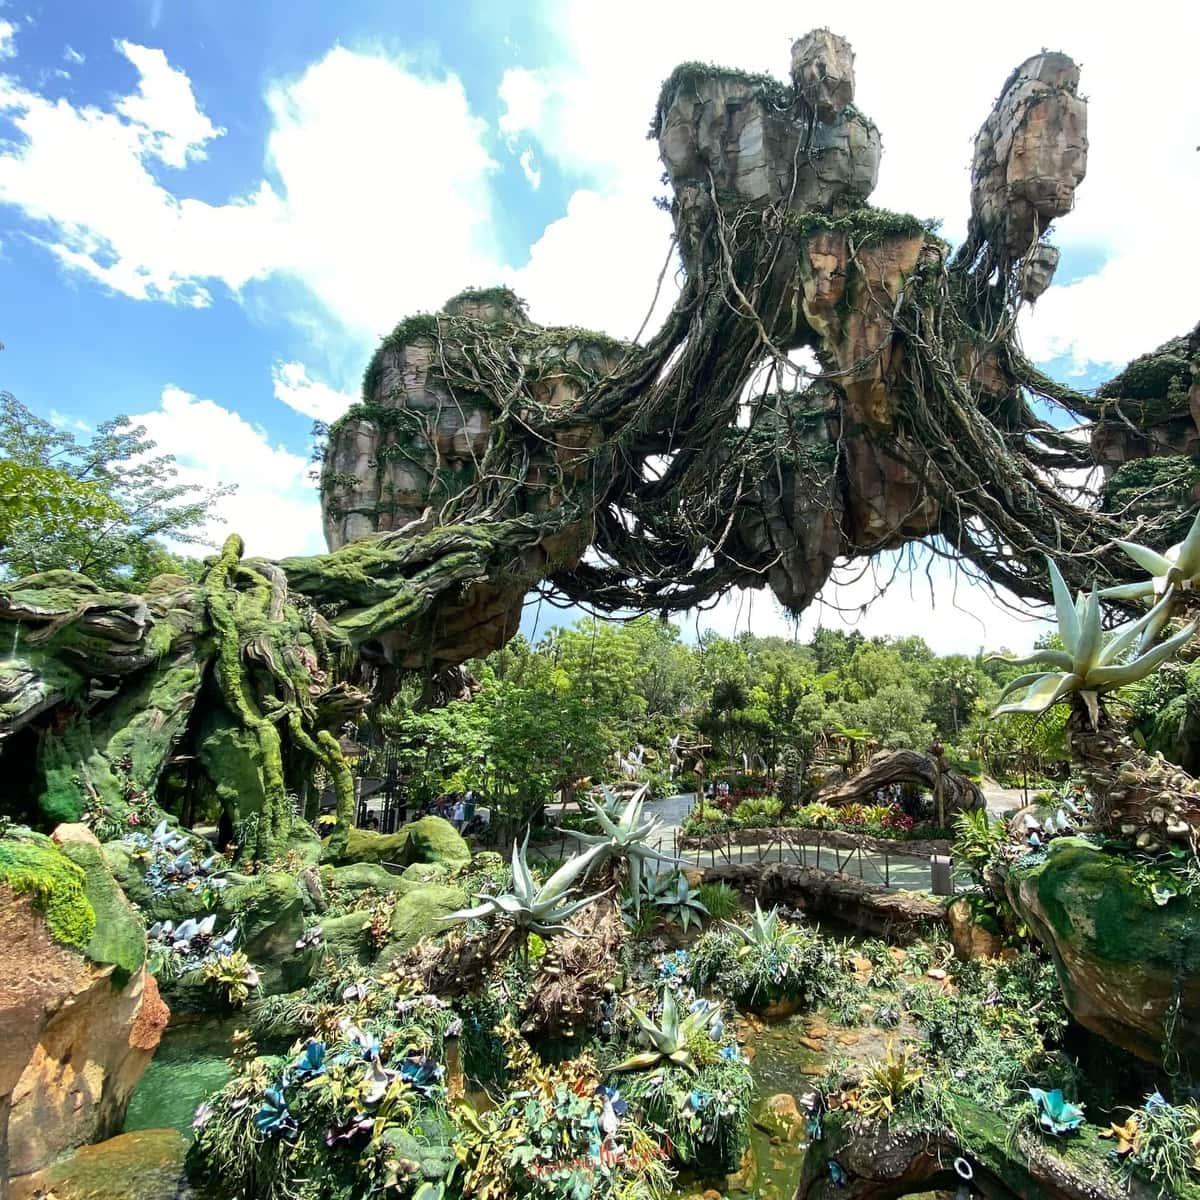 Pandora World of Avatar Floating Mountains 2 of Pandora wallpaper background for Microsoft Teams